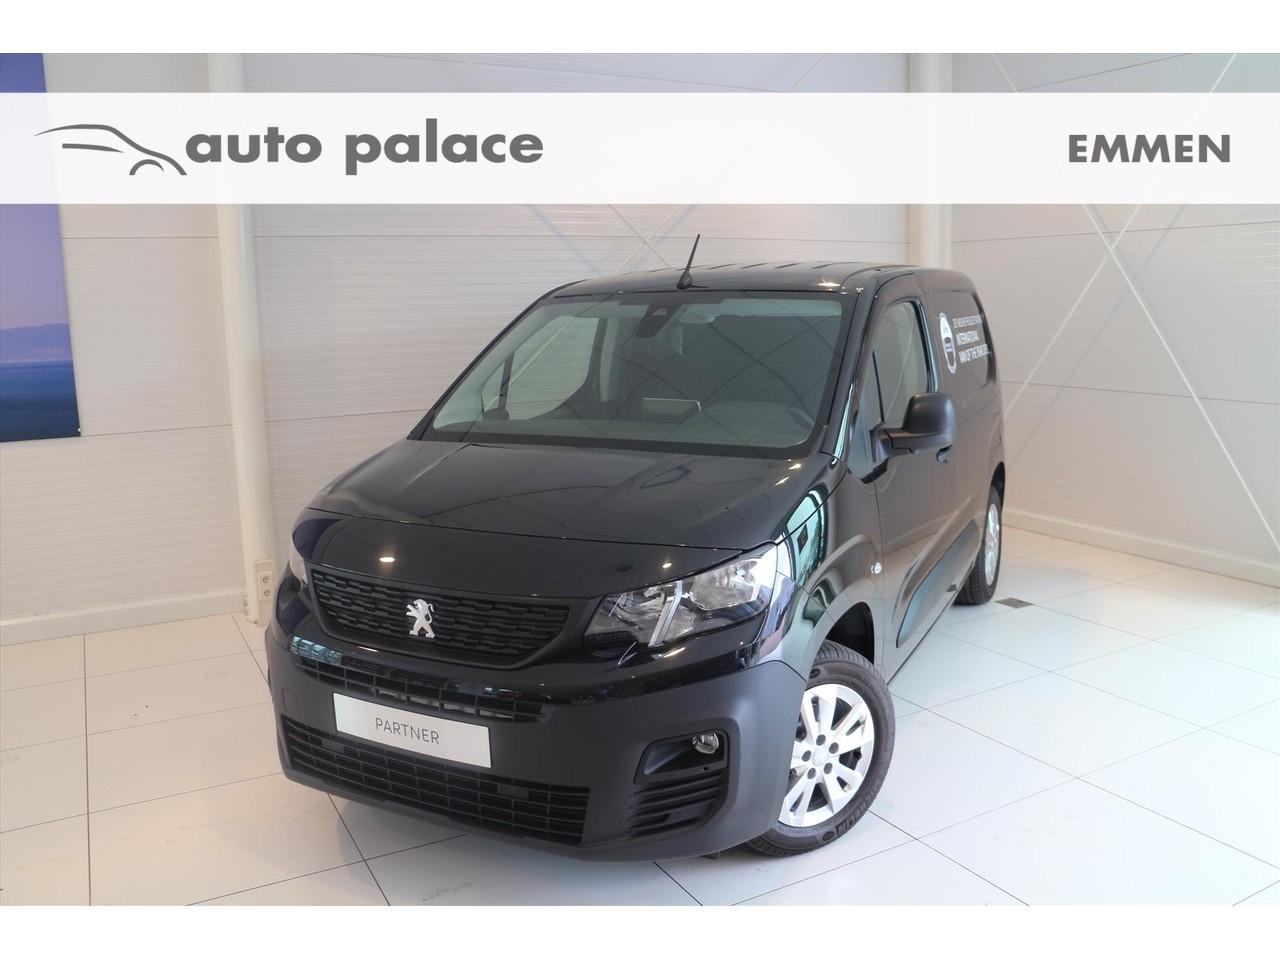 Peugeot Peugeot Partner 1.6 bluehdi 100pk 650kg asphalt